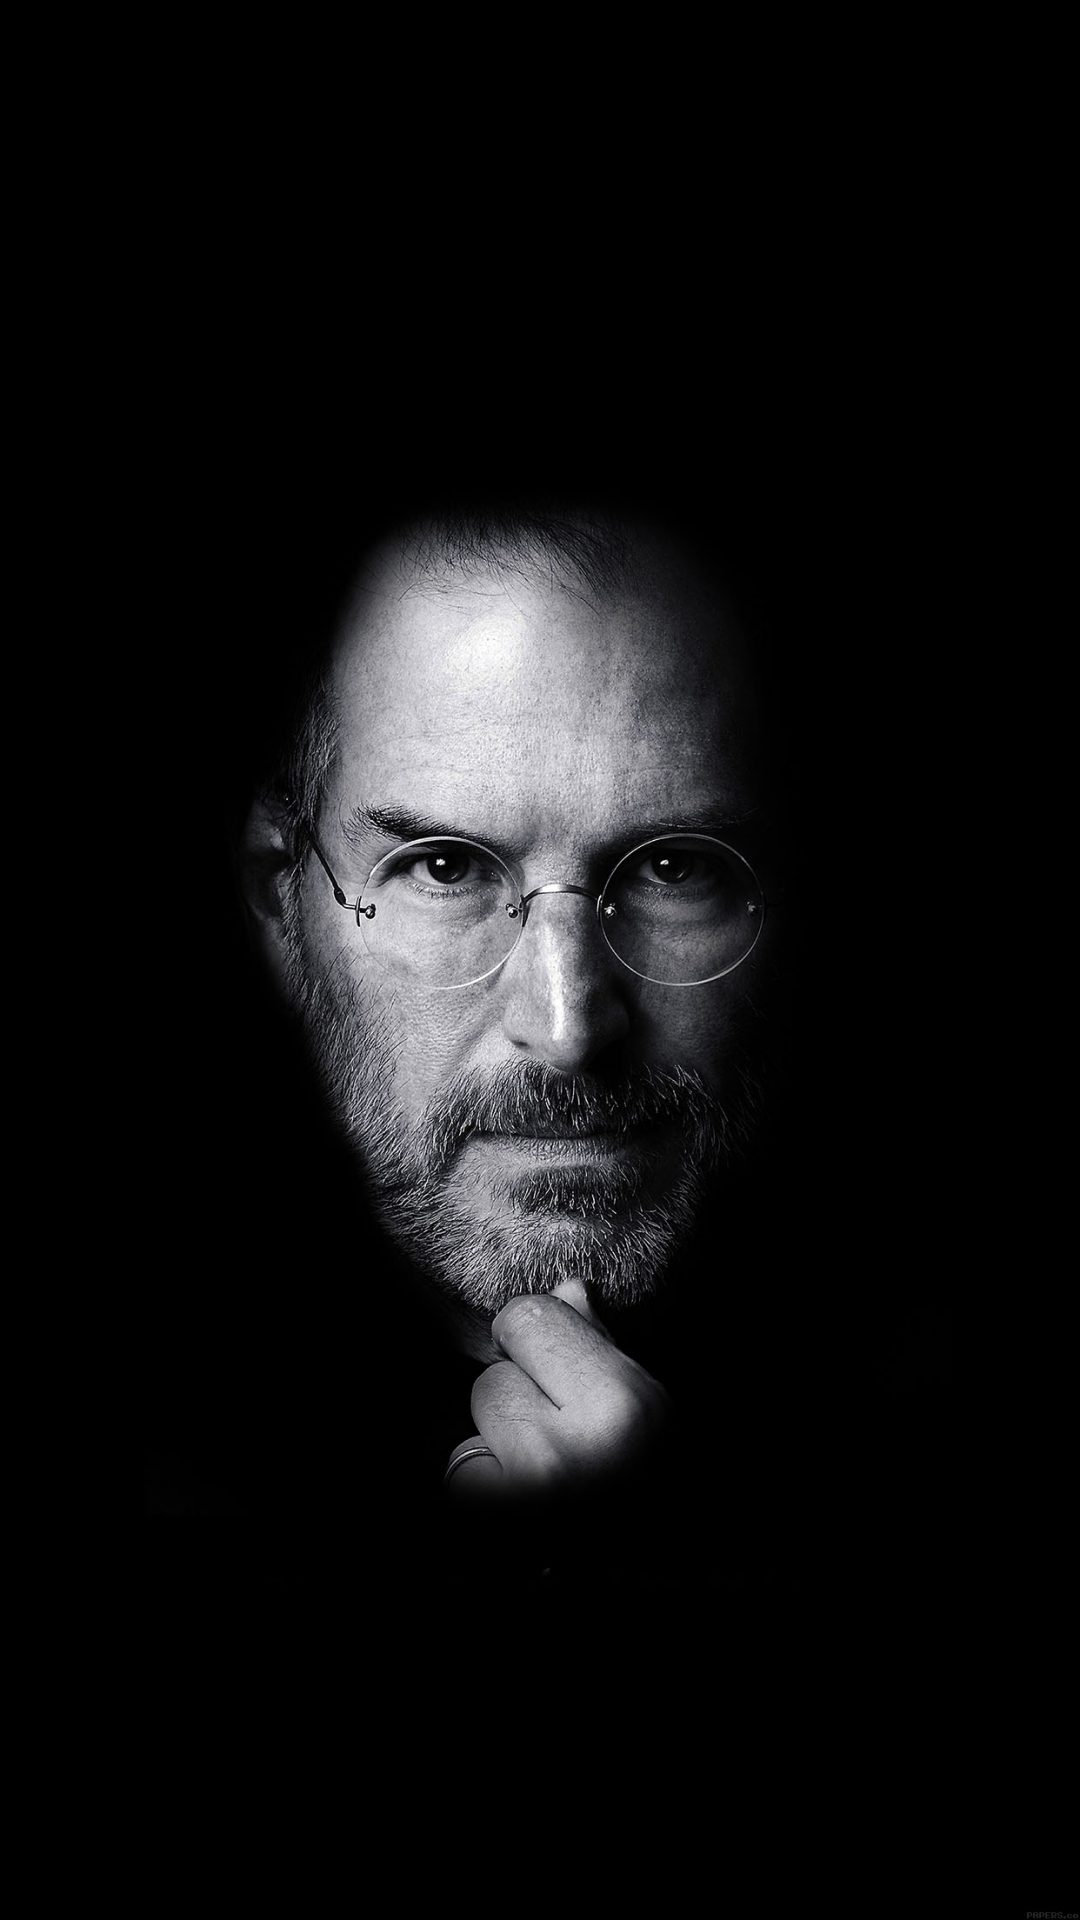 "Postada del ibro ""Steve Jobs"", de Walter Isaacson, proporcionada por la editorial Simon & Schuster. (Foto AP/Simon & Schuster)"